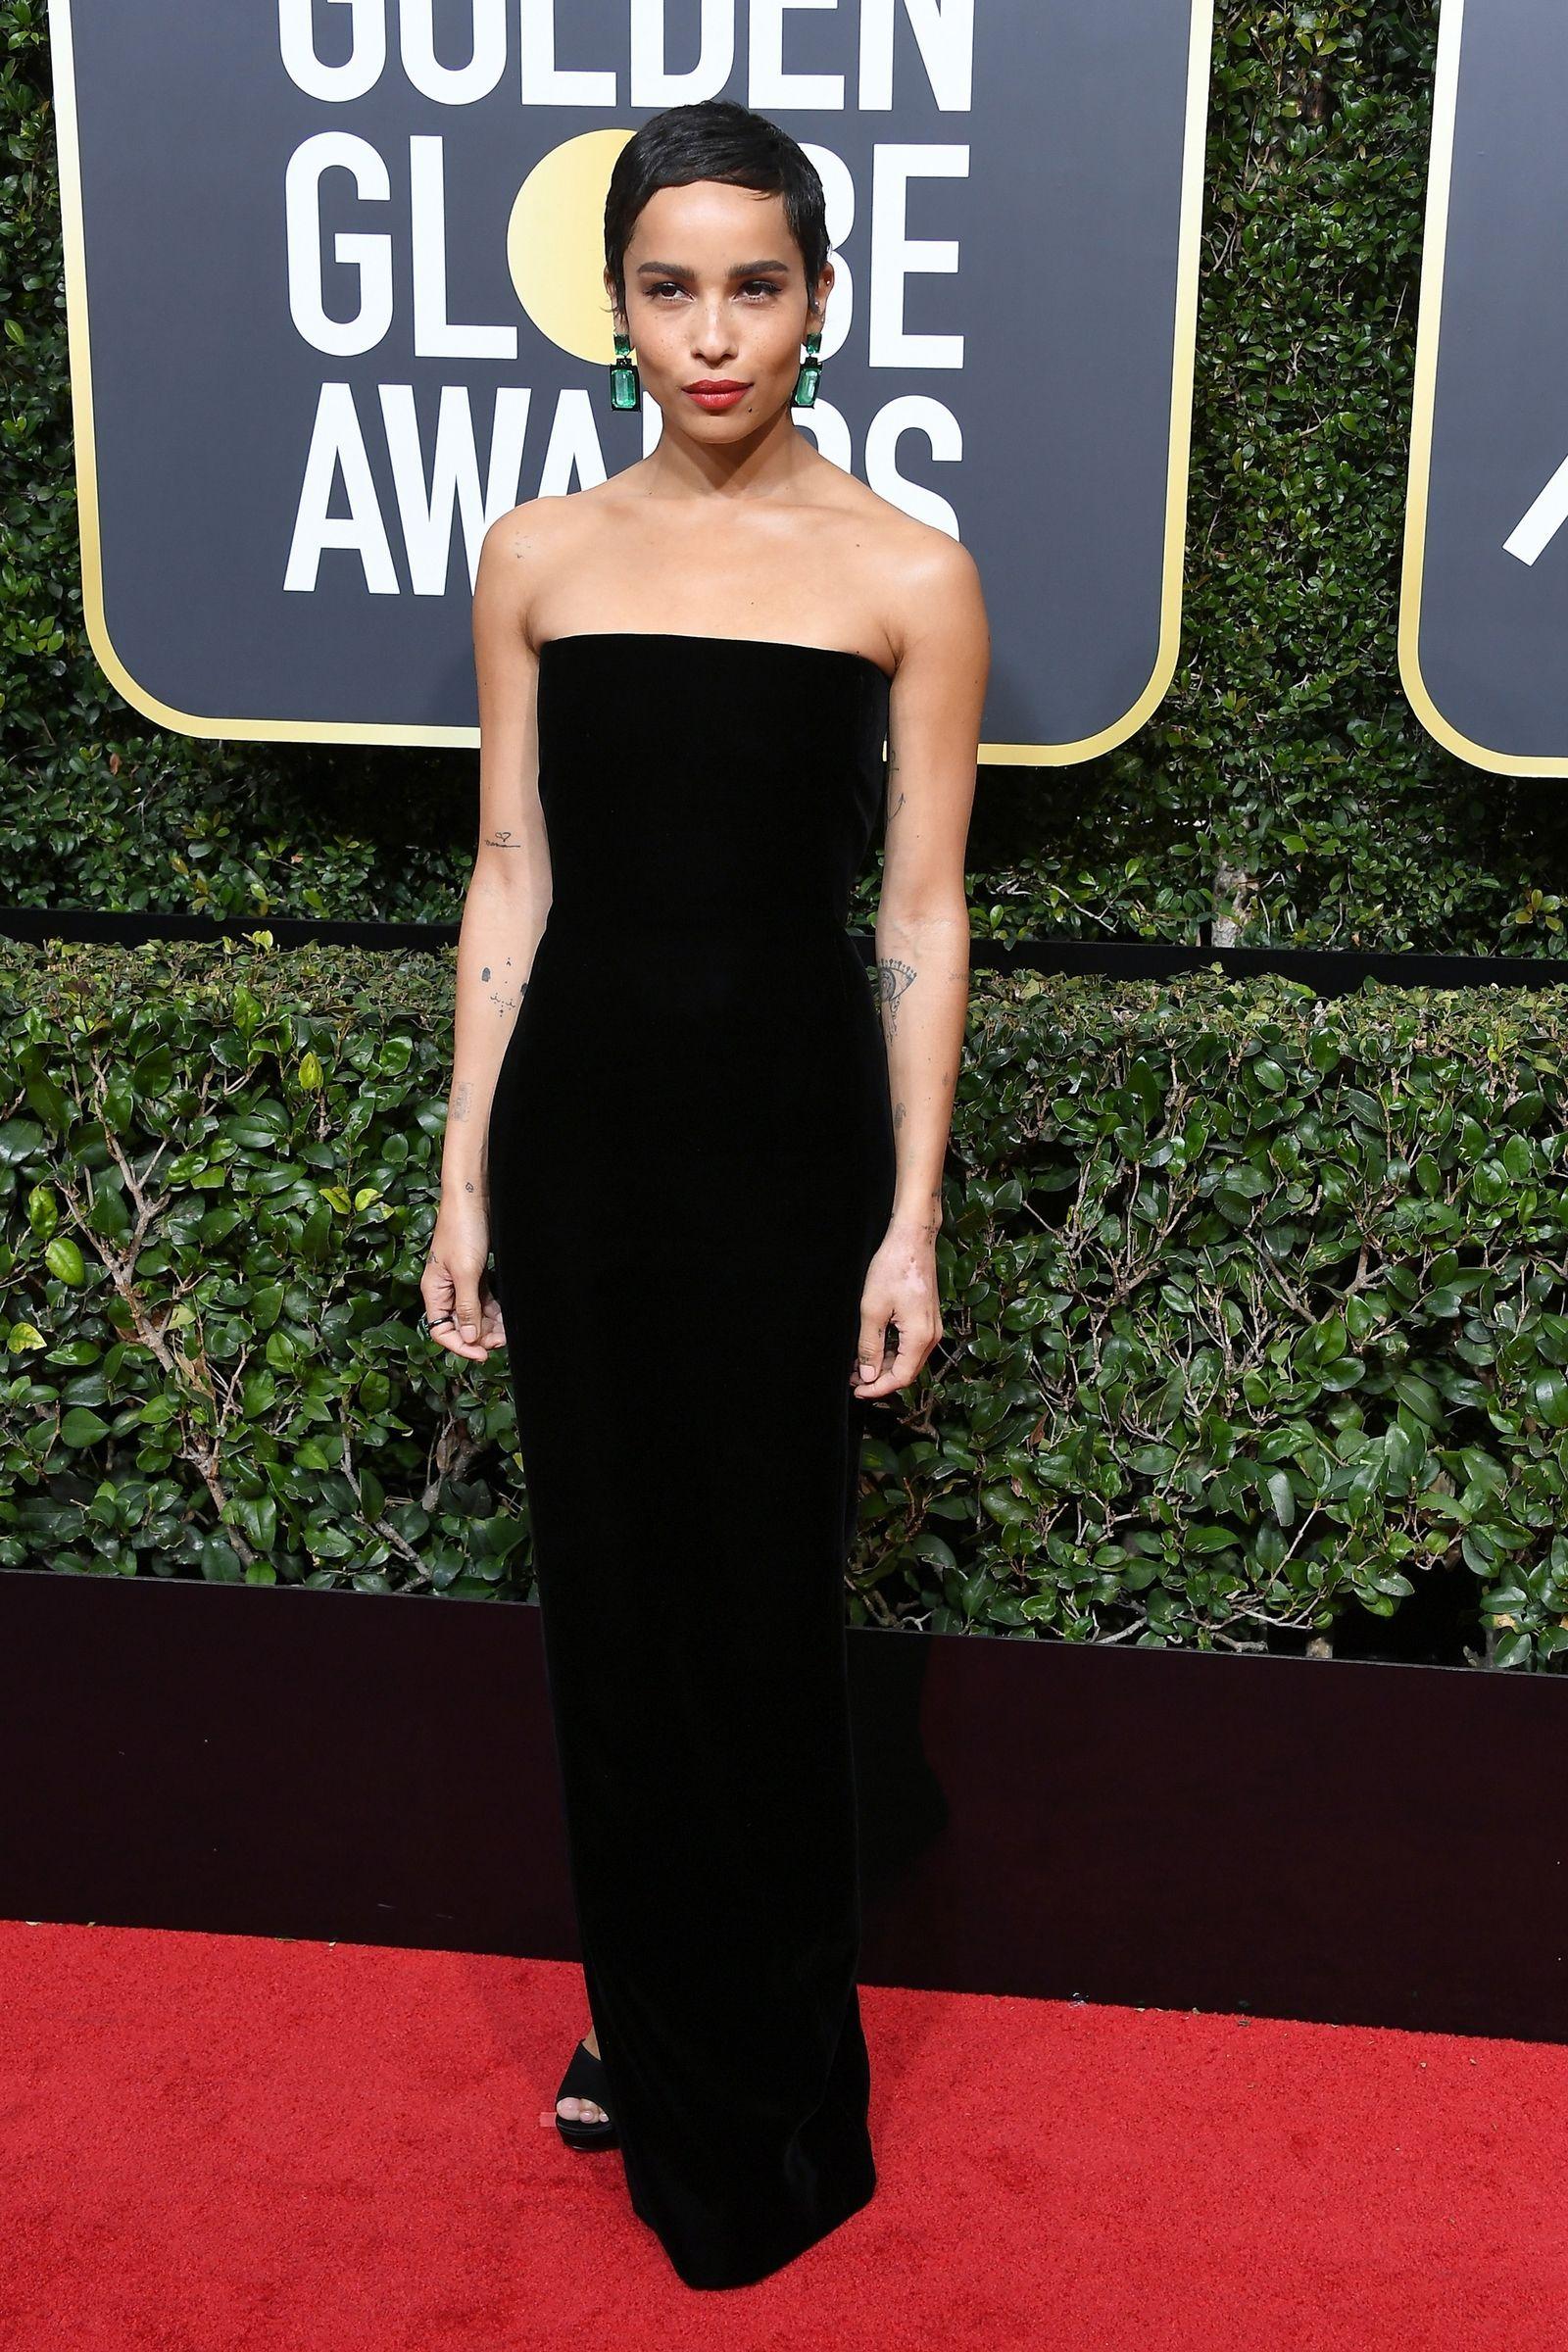 442119d5e3 Zoe Kravitz from 2018 Golden Globes Red Carpet Fashion in Saint Laurent